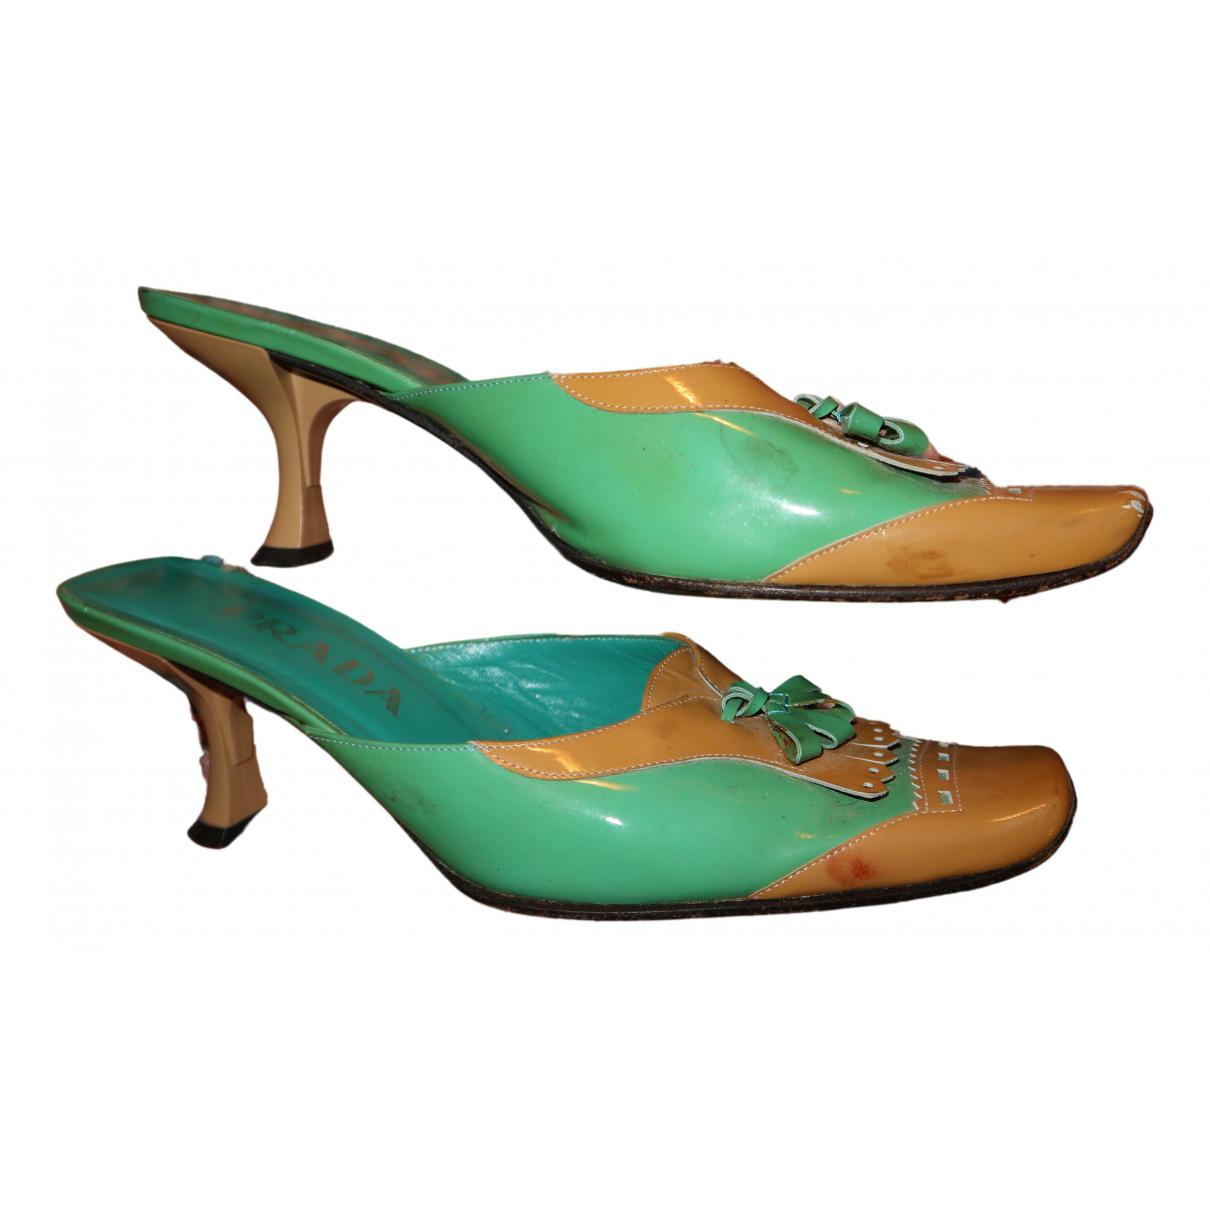 Prada - Sandales   pour femme en cuir verni - vert